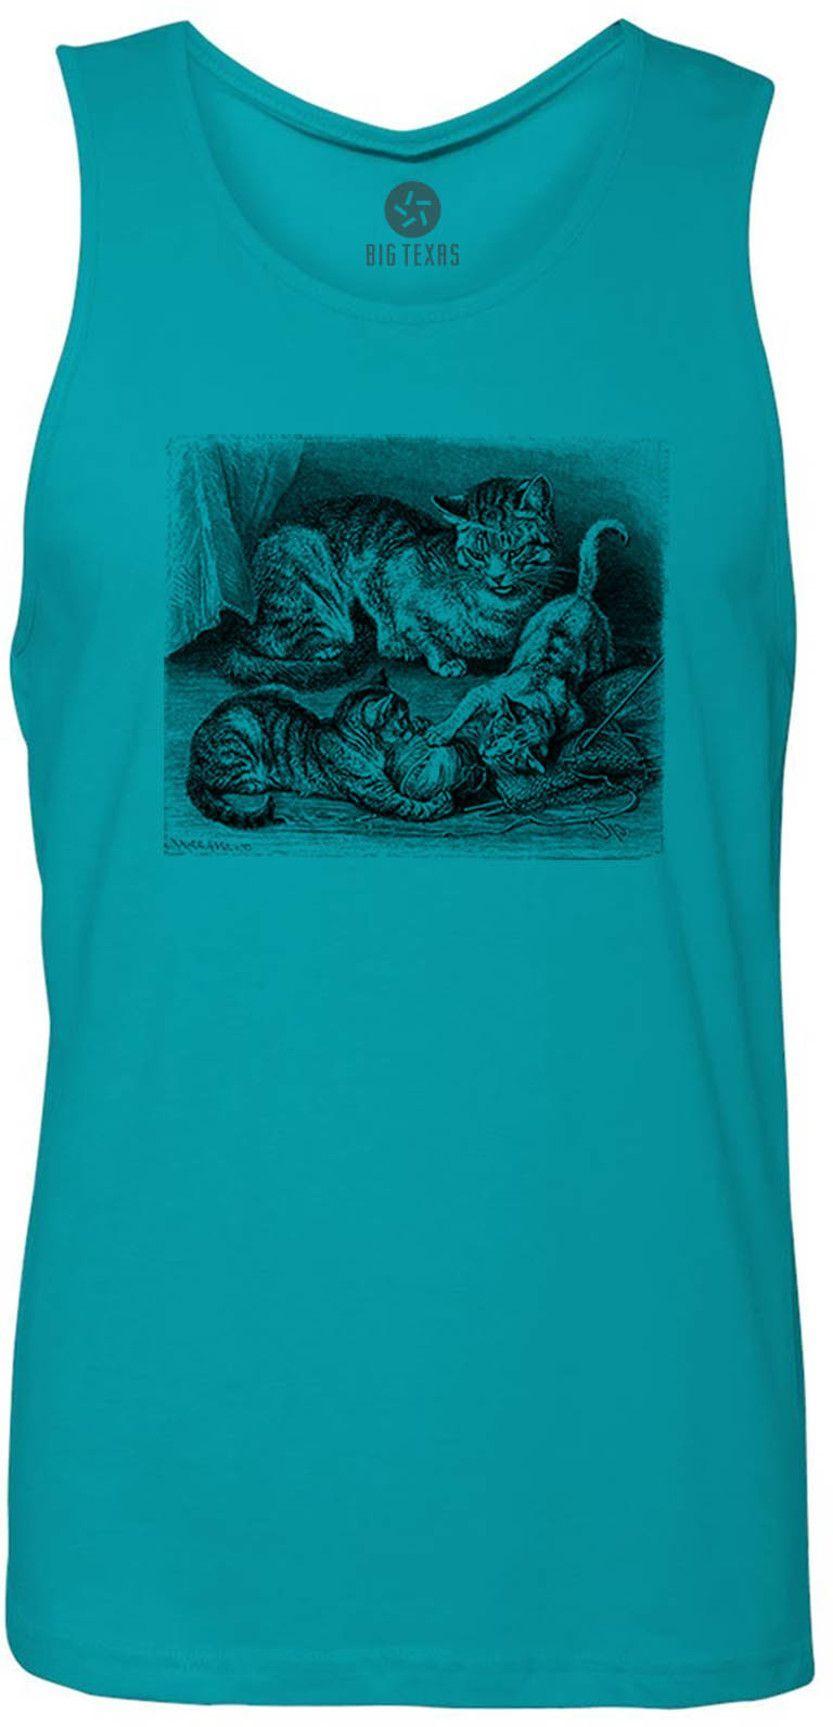 Kittens Playing with Yarn (Black) Tank-Top T-Shirt